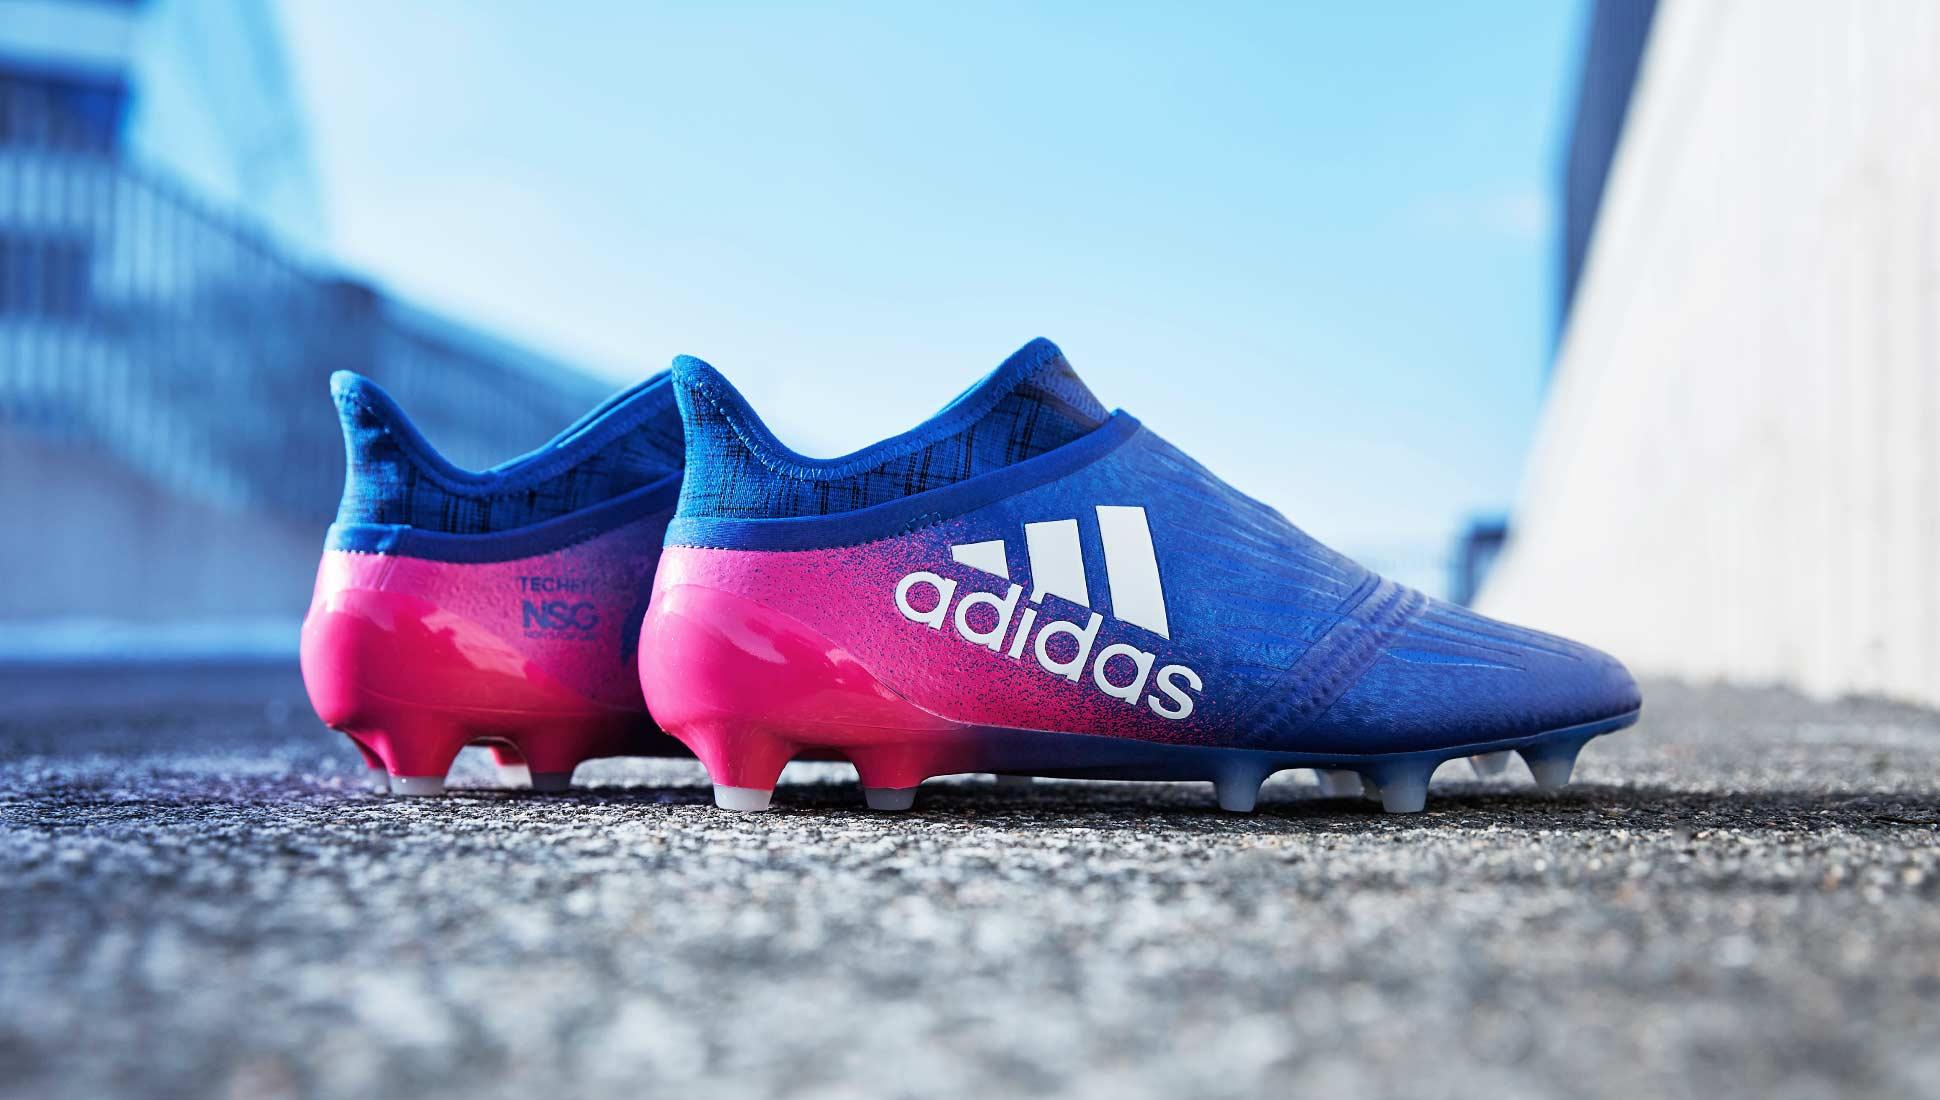 adidas x 16+ Purechaos Football Boots - SoccerBible b8c6c7d0370f